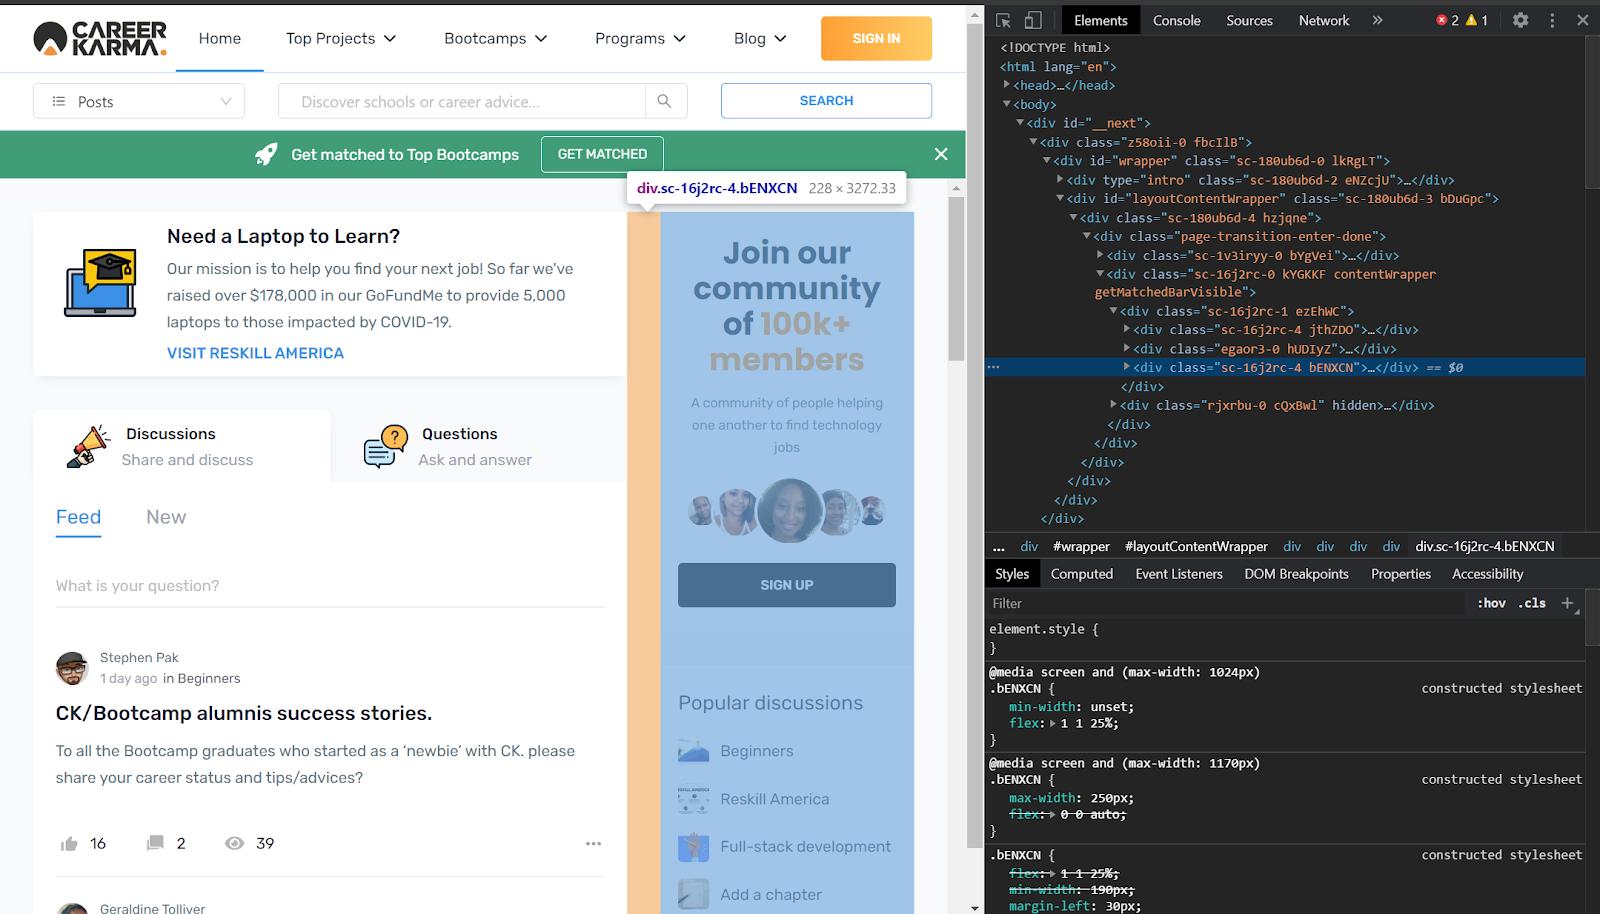 screenshot-of-career-karma-honepage-with-HTML-elements-displayed